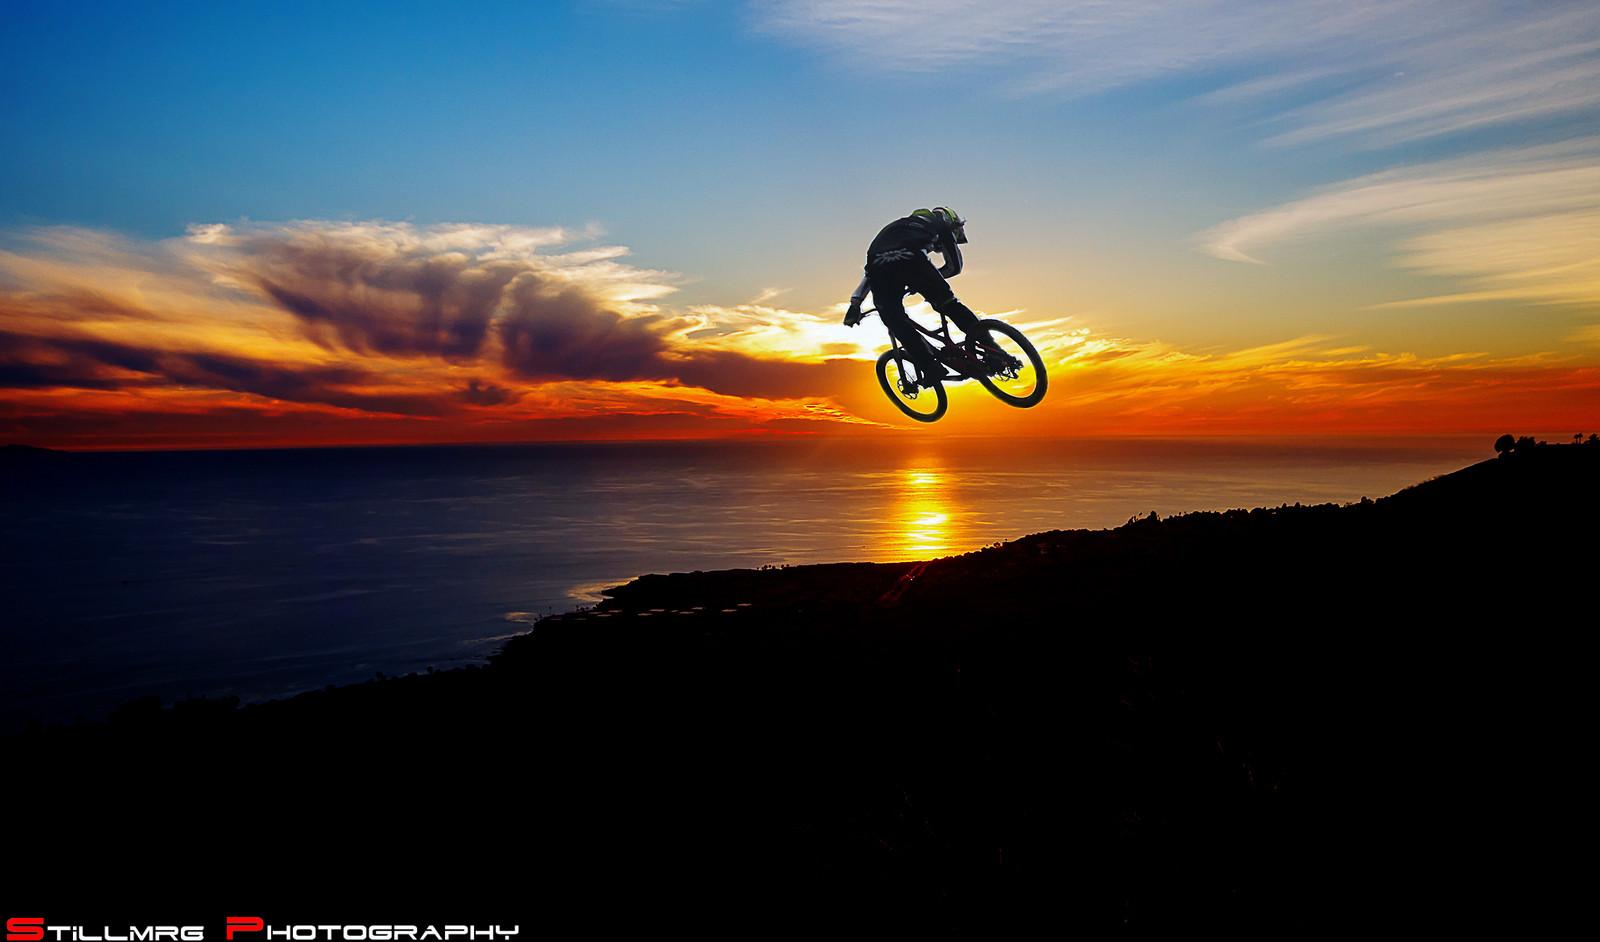 How I love Cal Sunset - Stillmrg Photography - Mountain Biking Pictures - Vital MTB